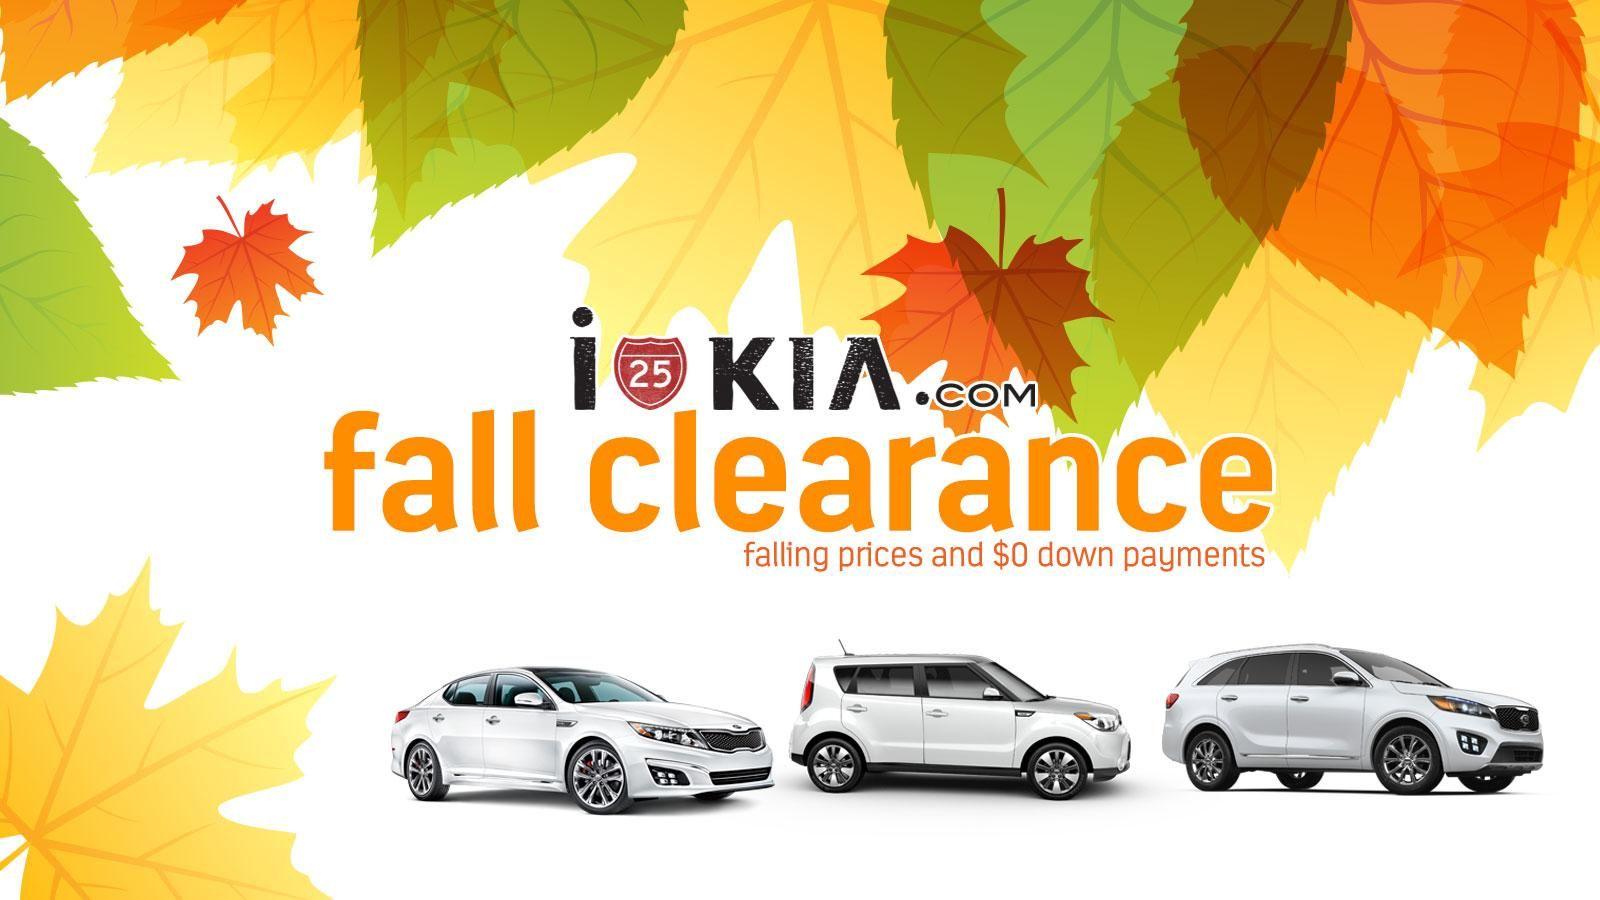 Kia Denver Dealership Rated 1 Colorado Kia Dealer Kia Event Dealership